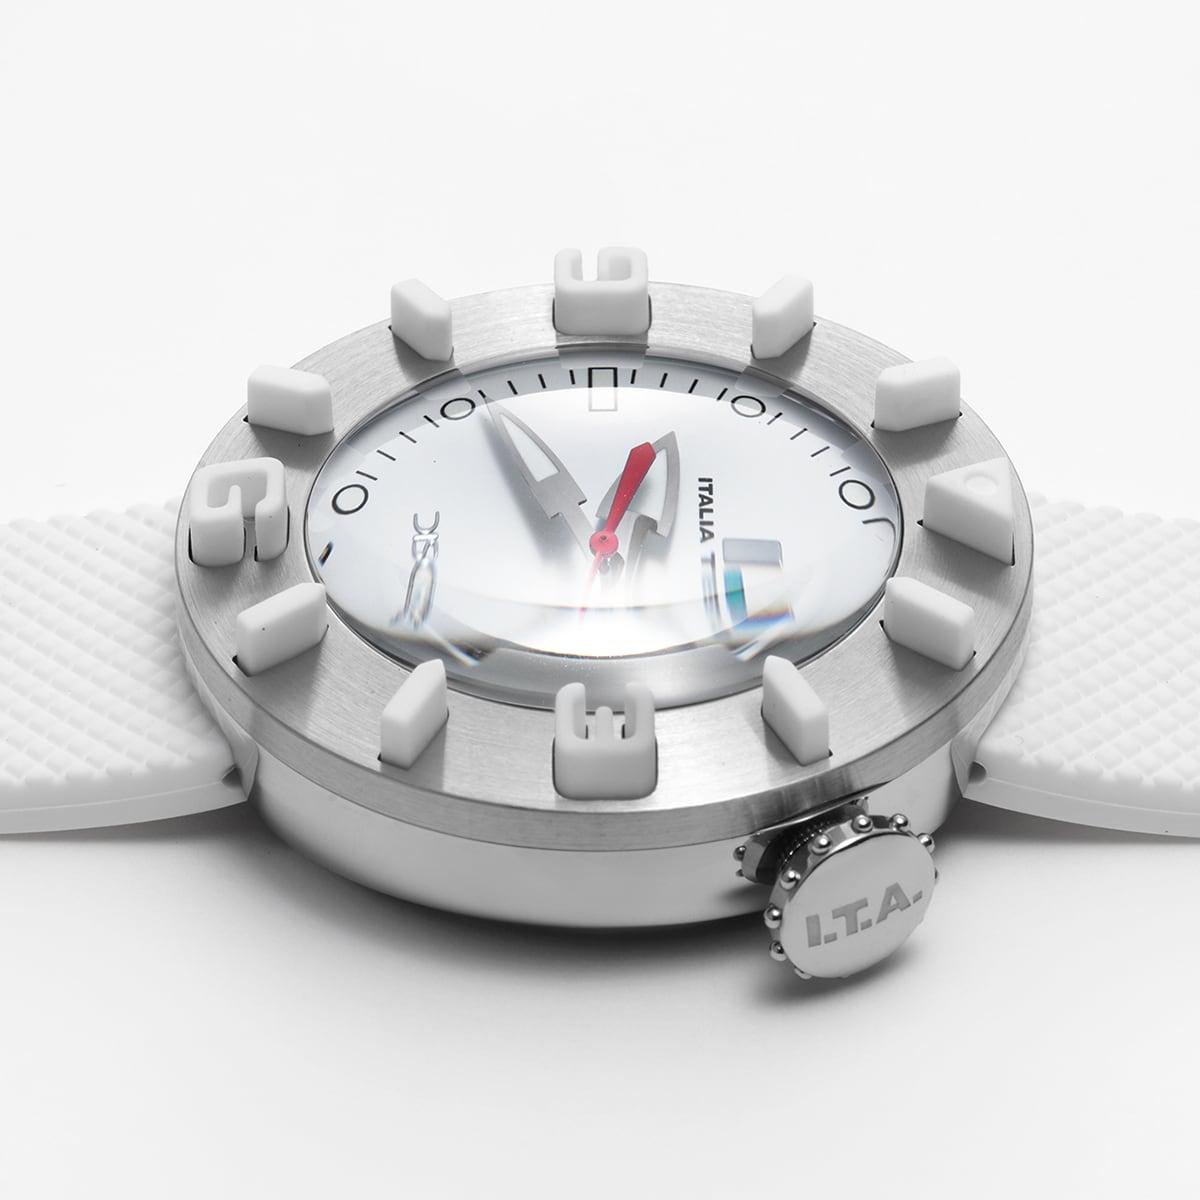 【I.T.A. アイティエー】DISCO VOLANTE ディスコ・ボランテ(ホワイト)/国内正規品 腕時計